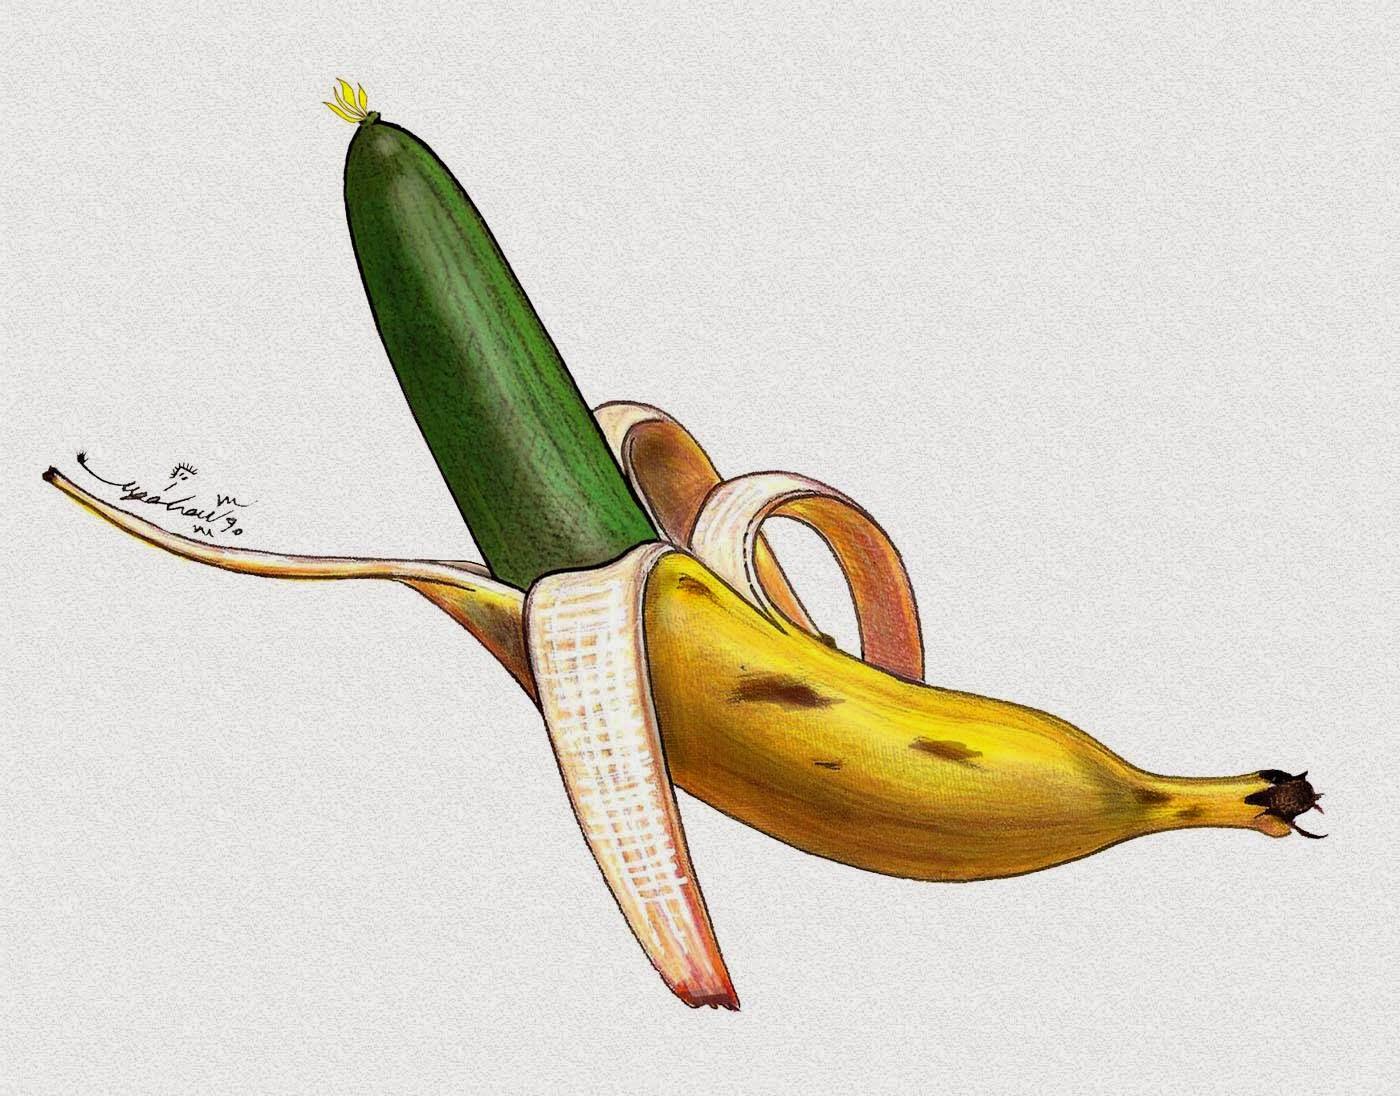 banana  mana  cucumber  father